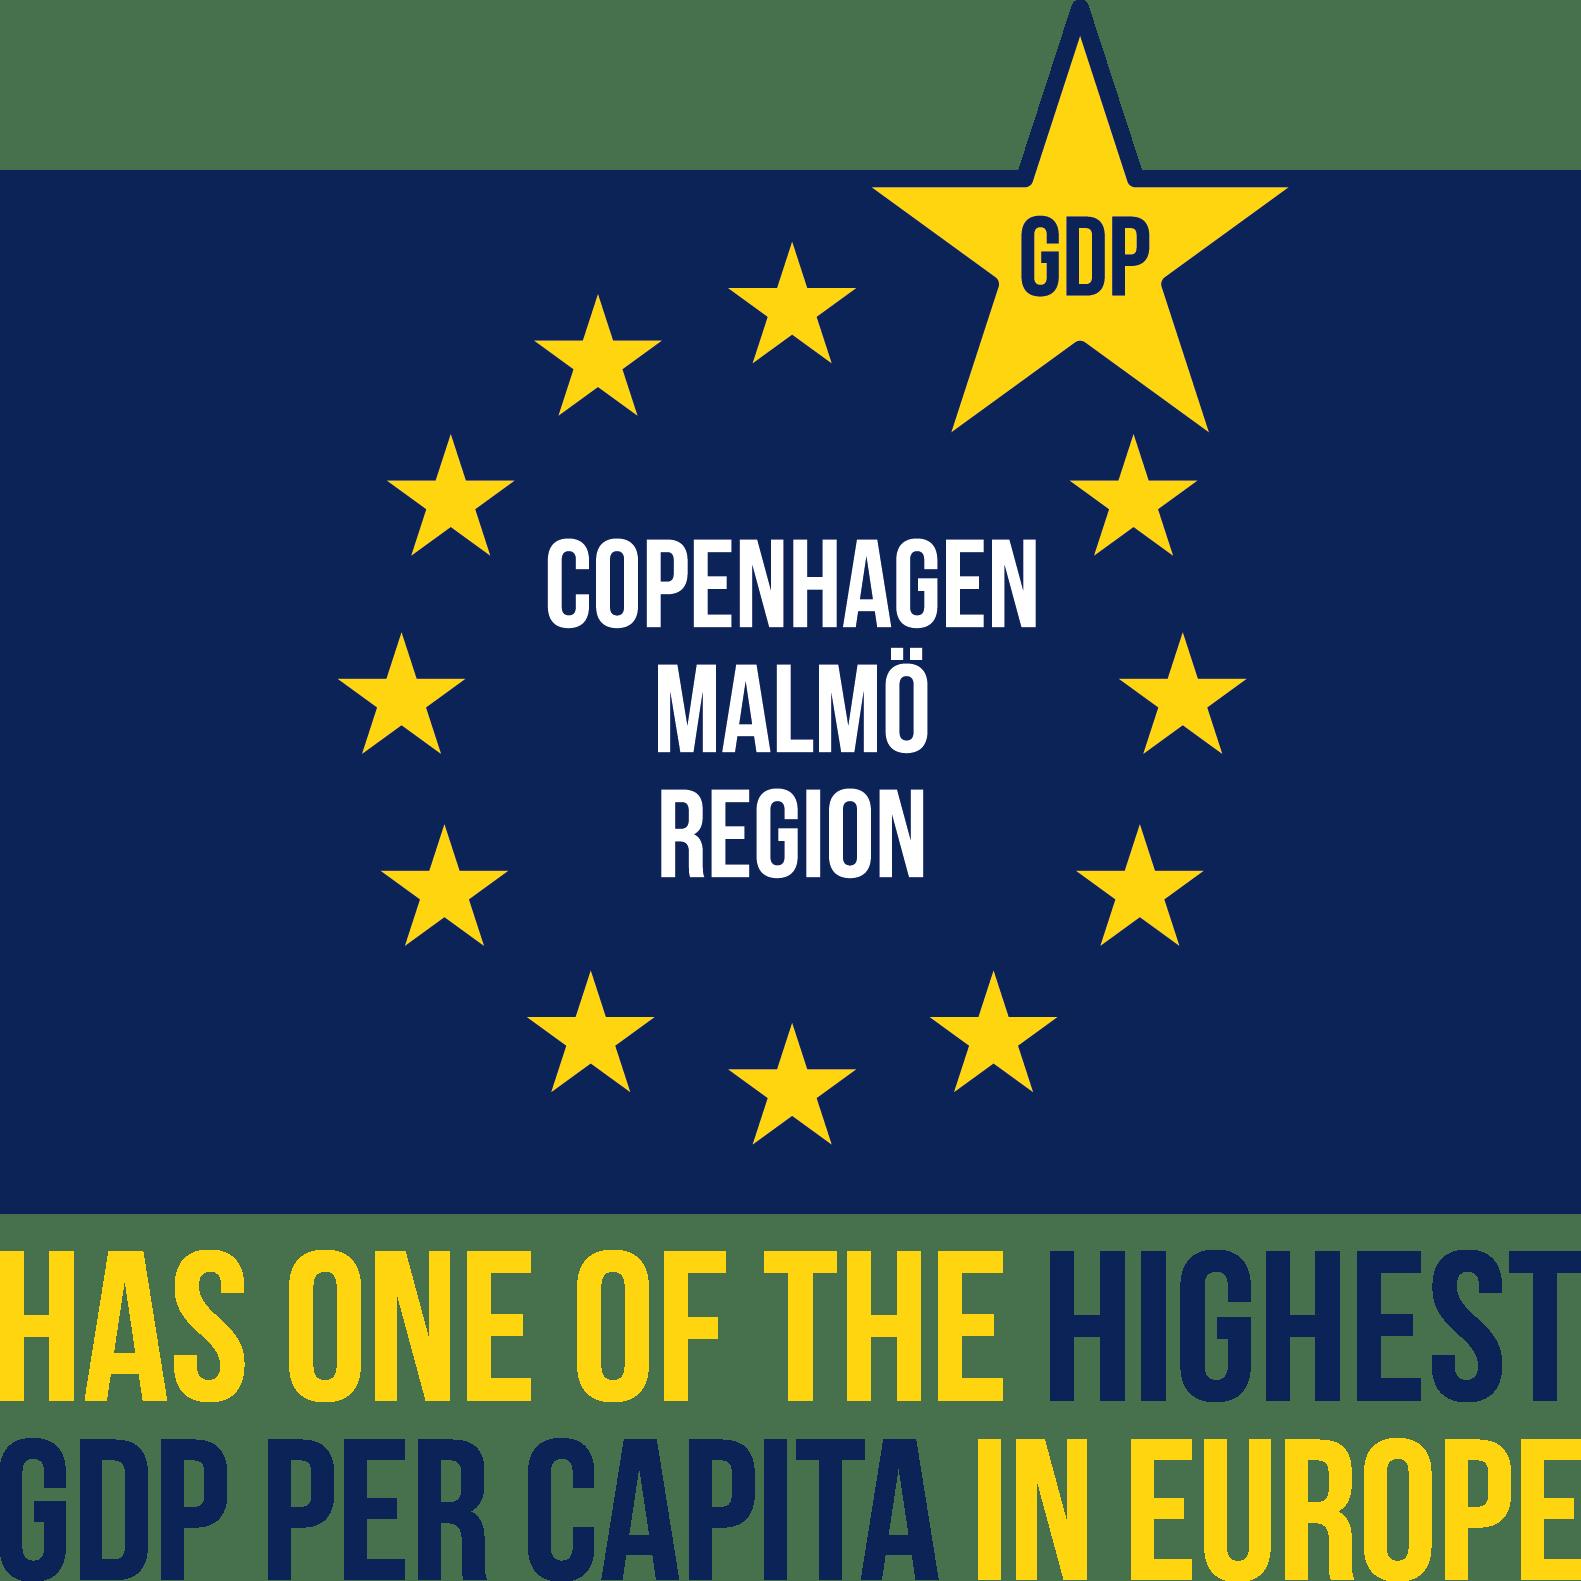 The Greater Copenhagen Region